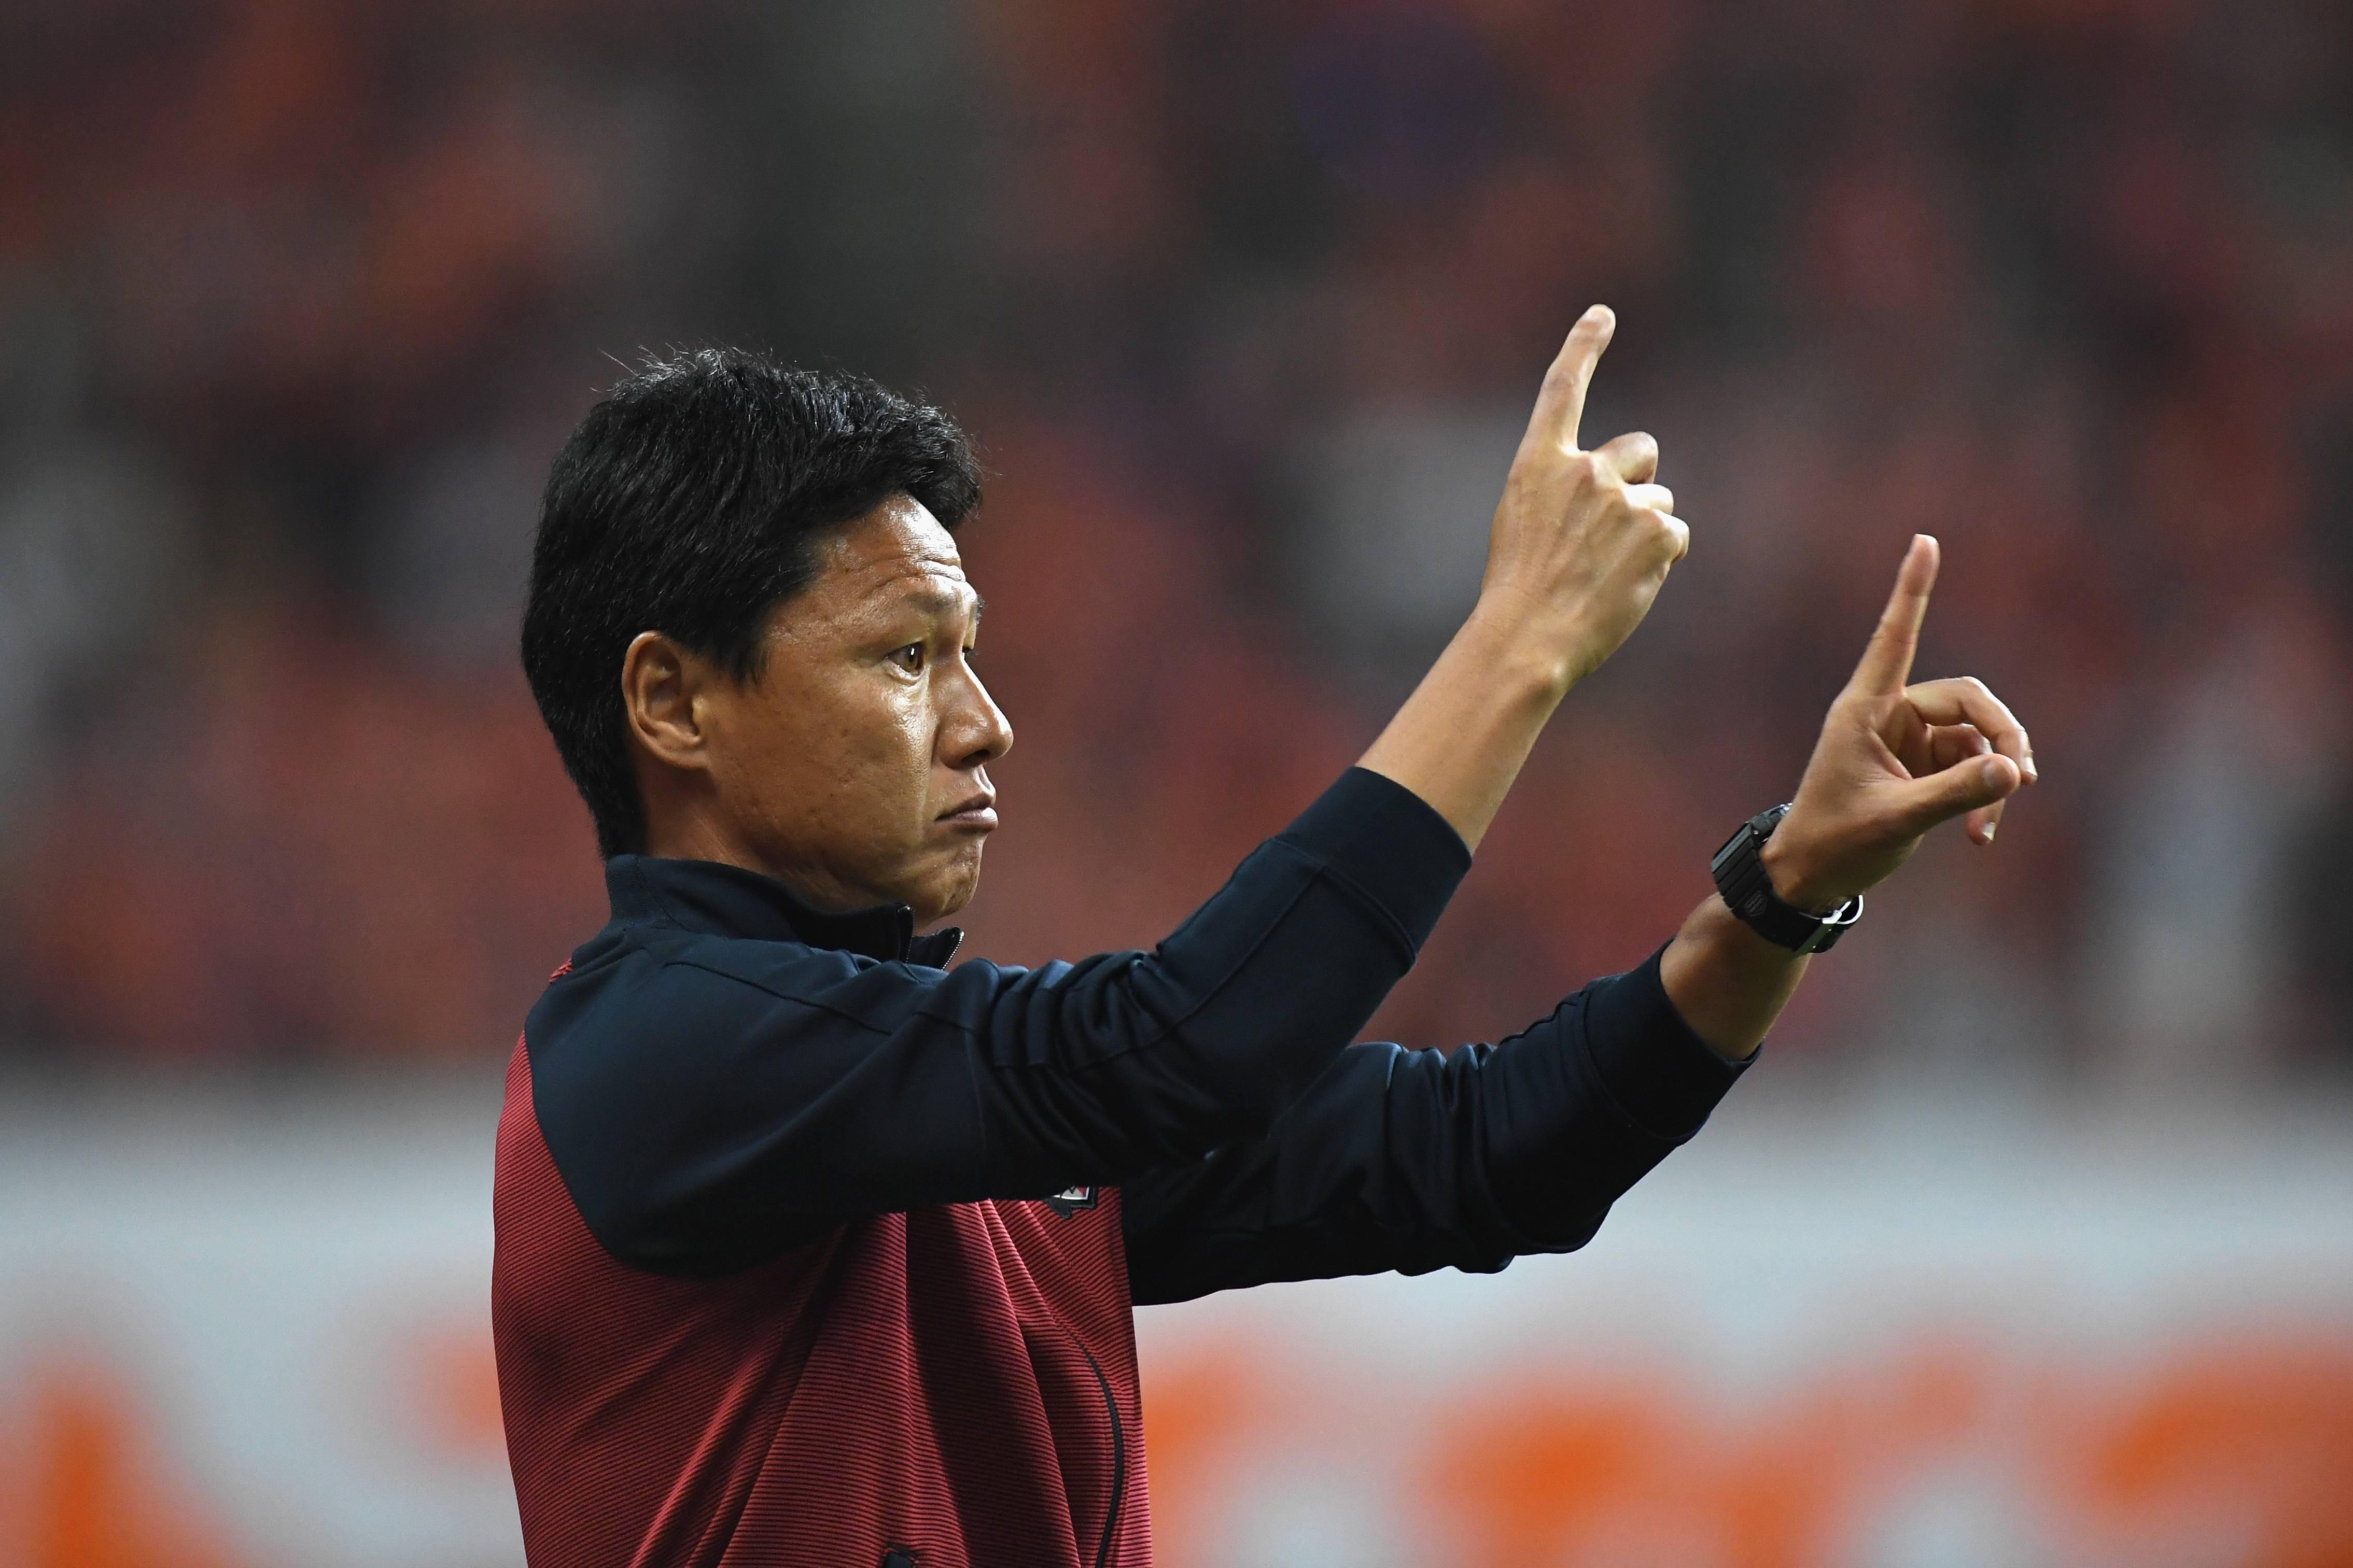 Oiwa praises aggressive Antlers after Suwon win